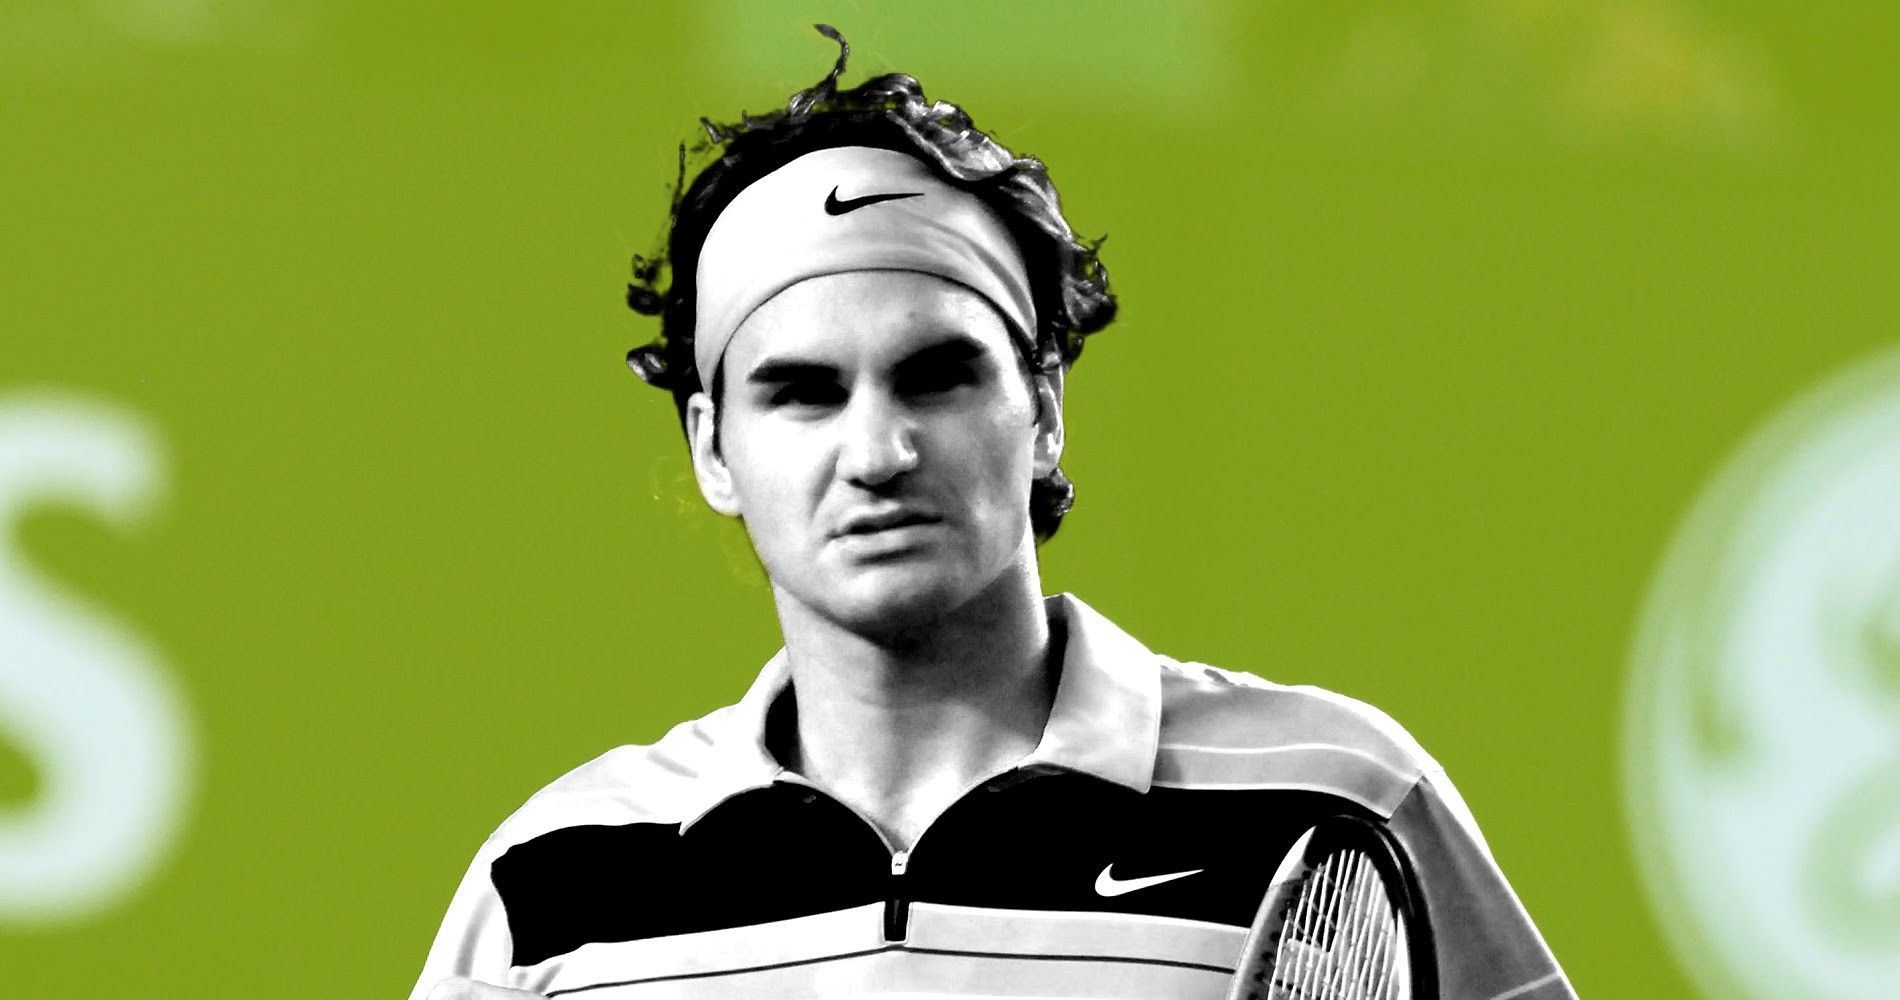 Roger Federer, On this day, 02/26